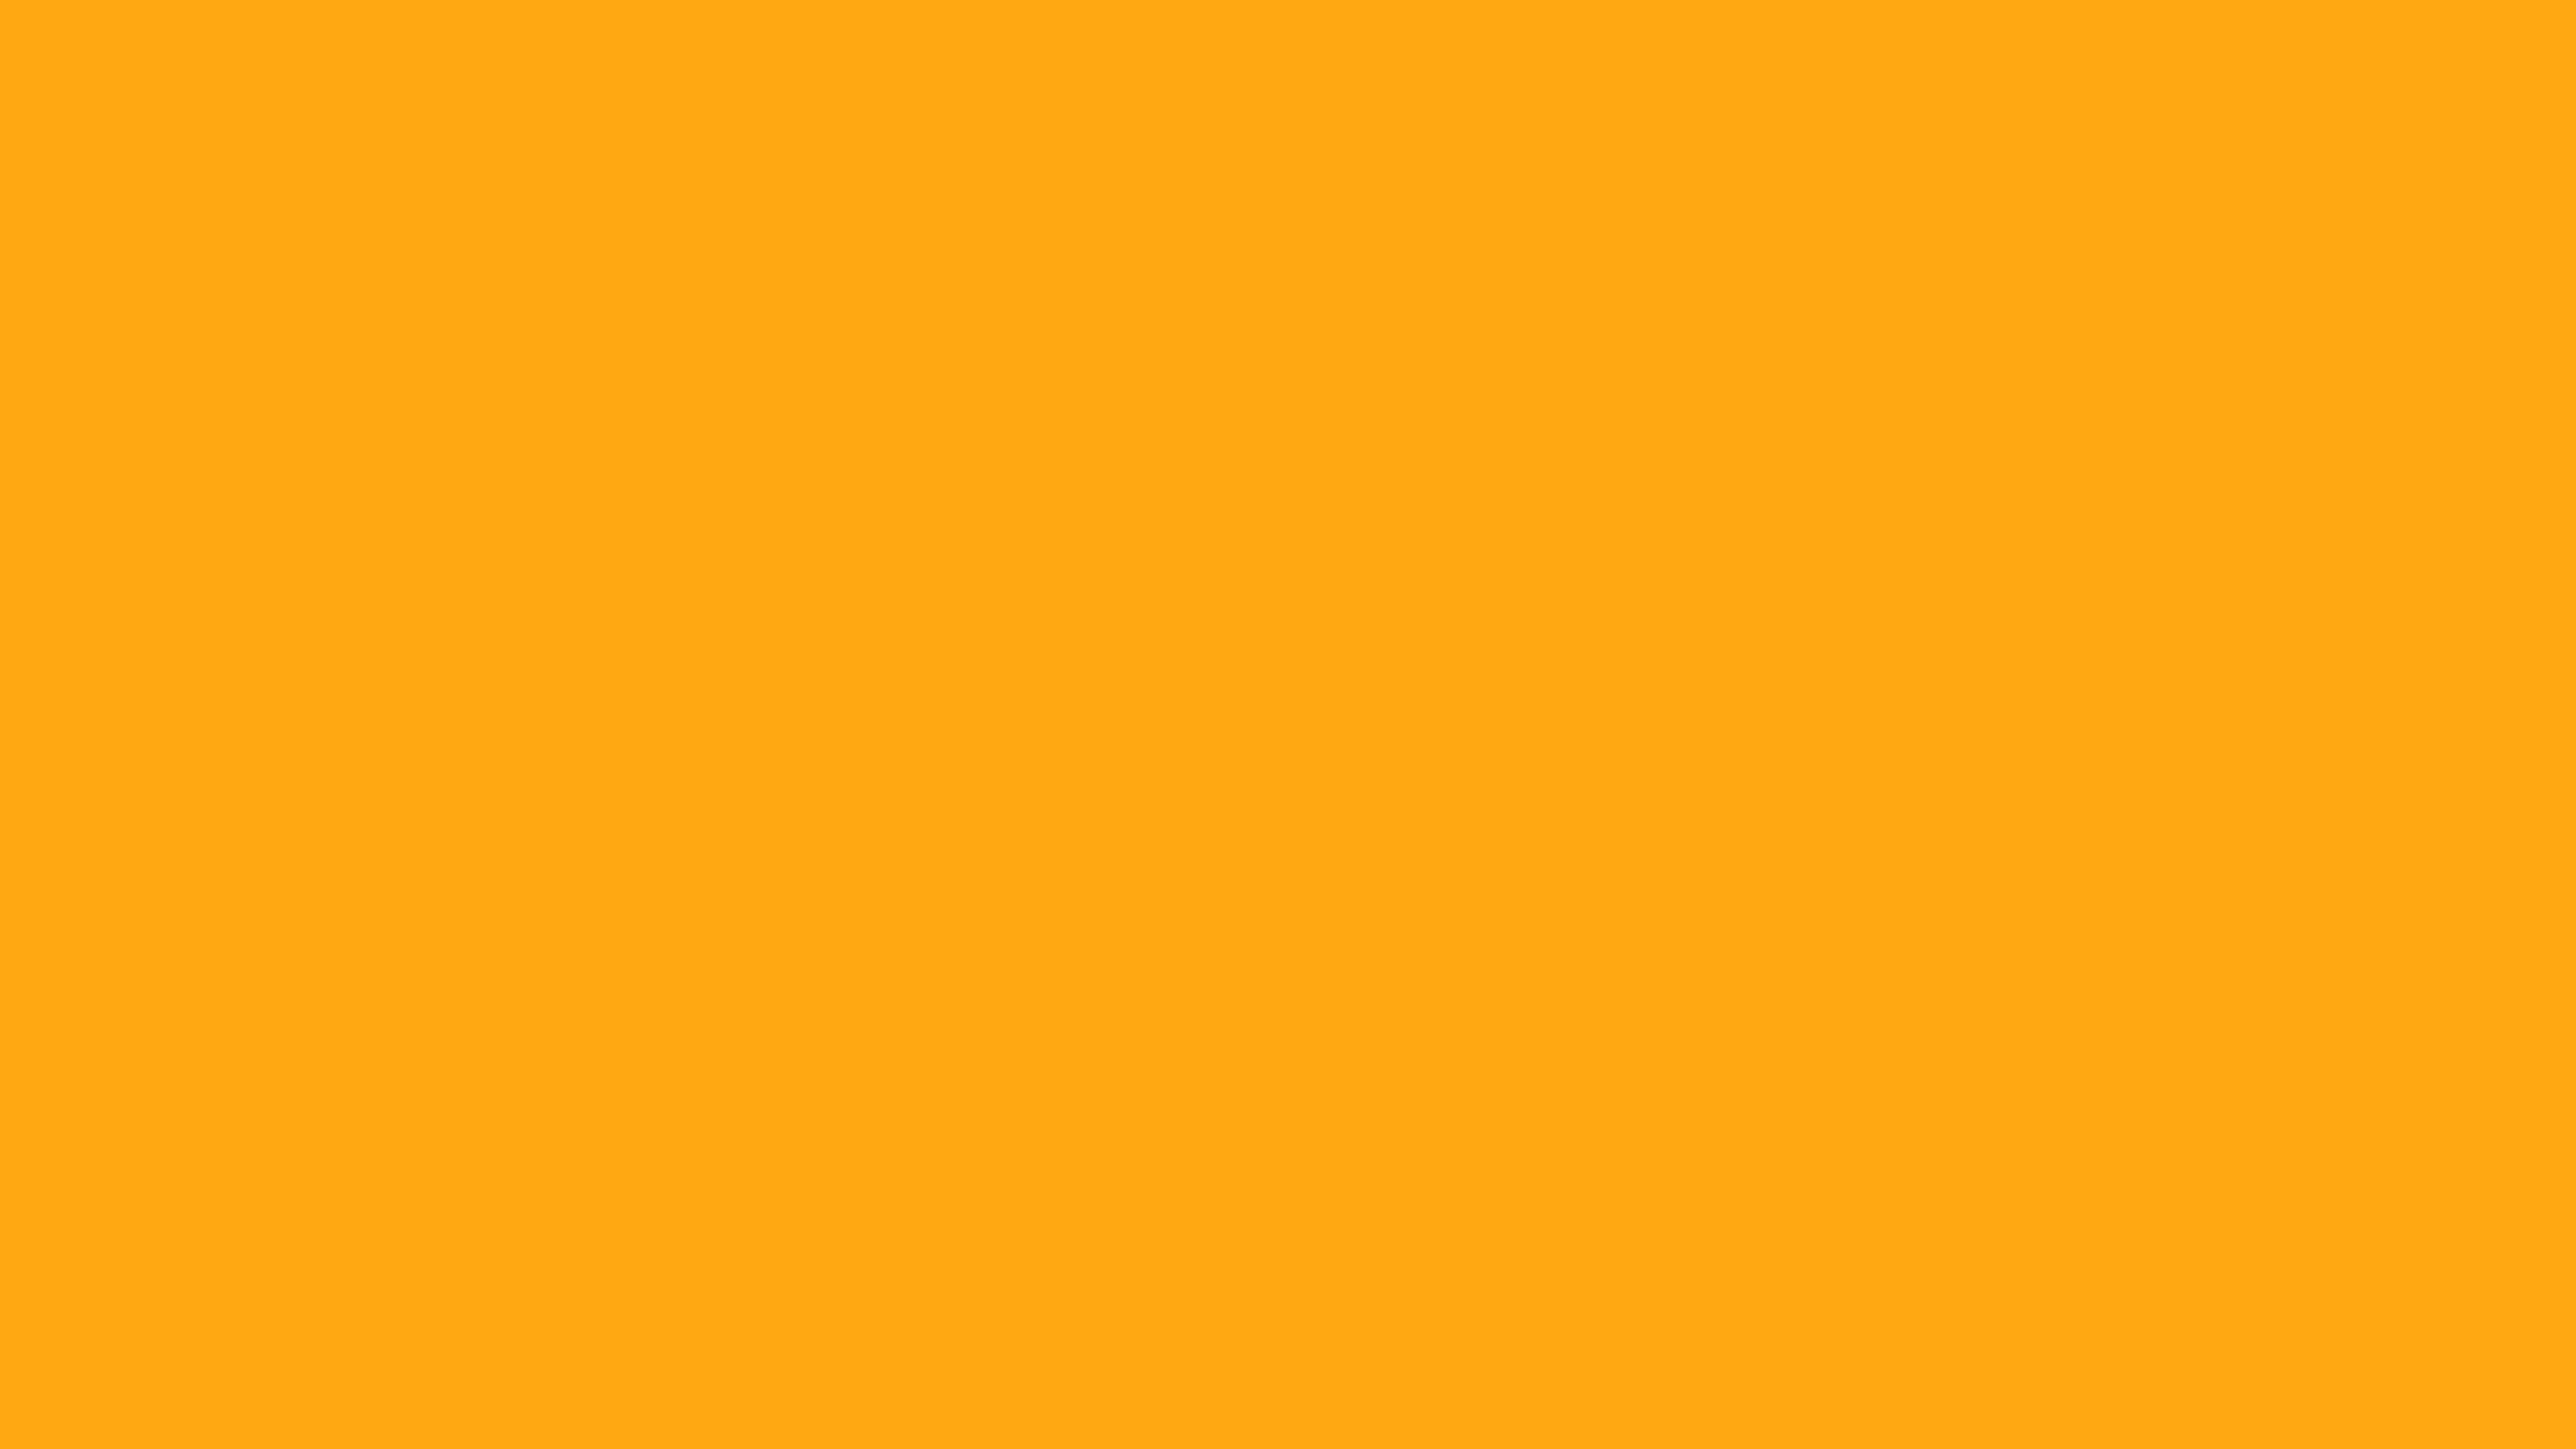 3840x2160 Dark Tangerine Solid Color Background